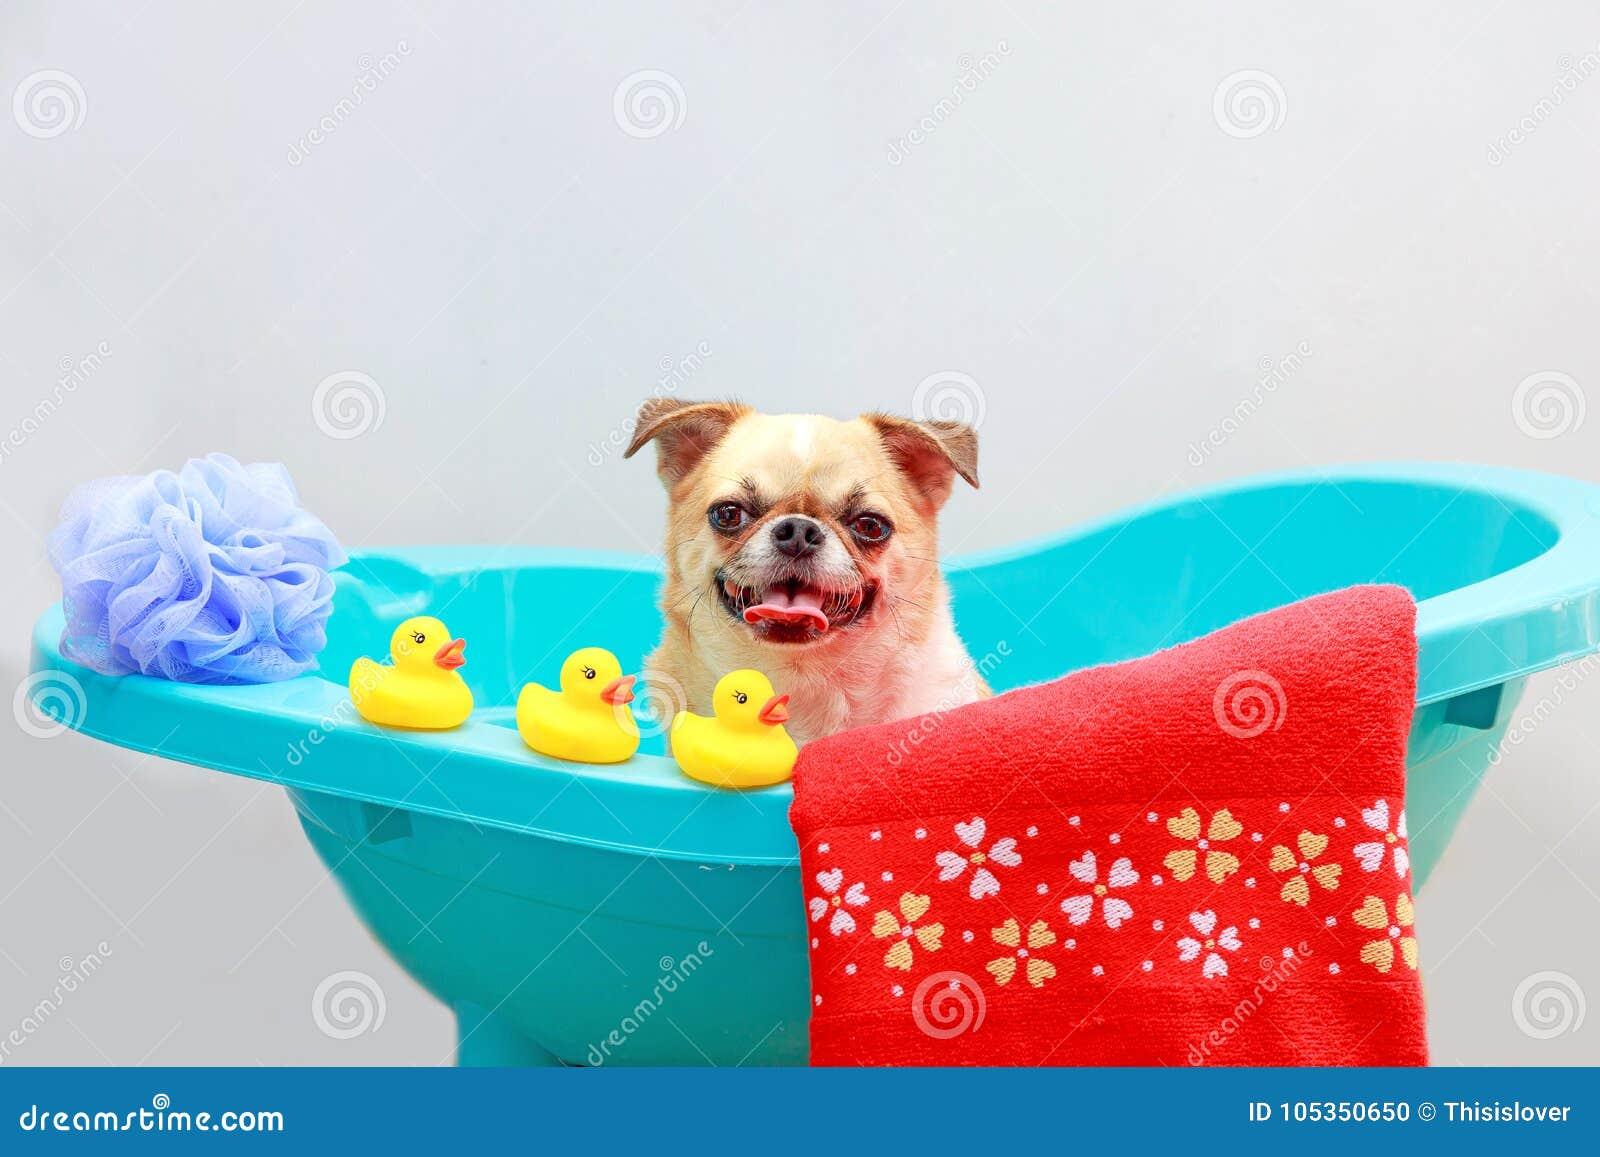 Dog taking a shower